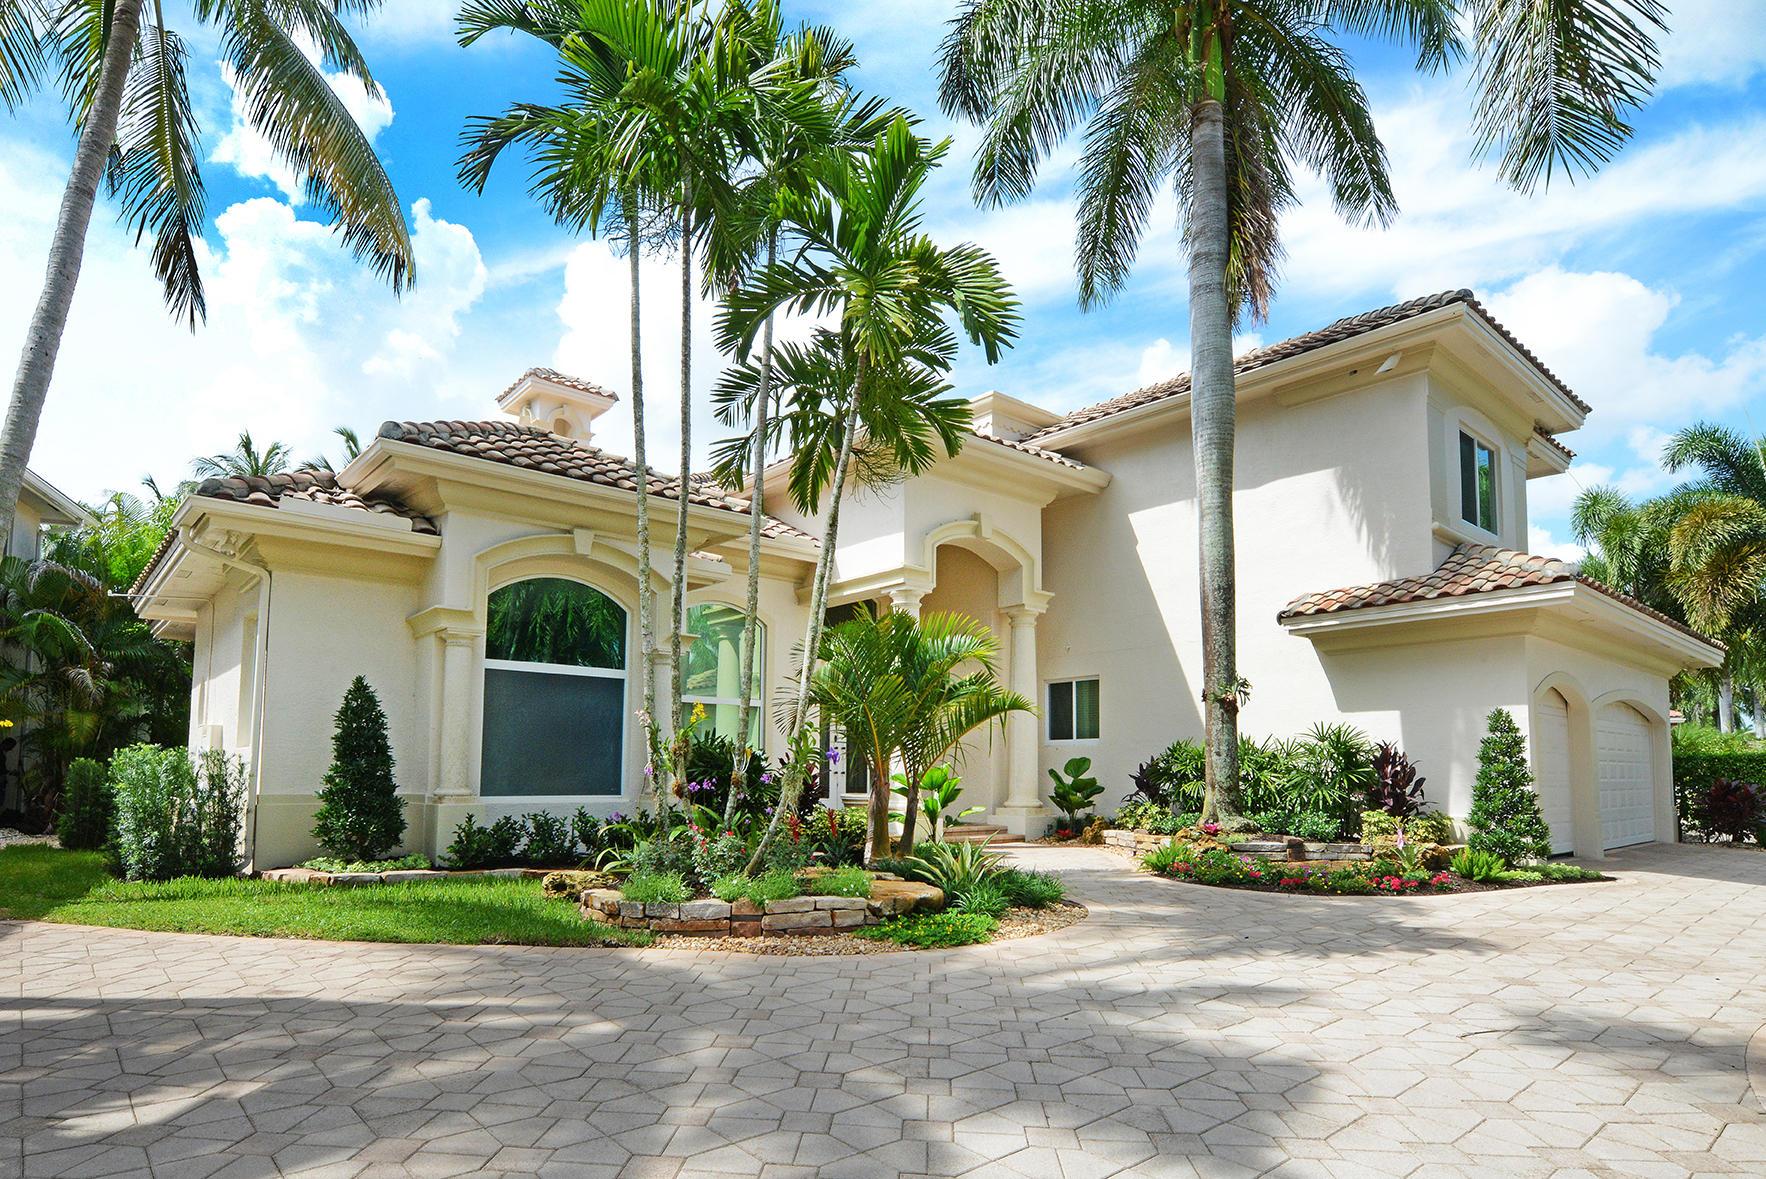 Photo of 6554 Landings Court, Boca Raton, FL 33496